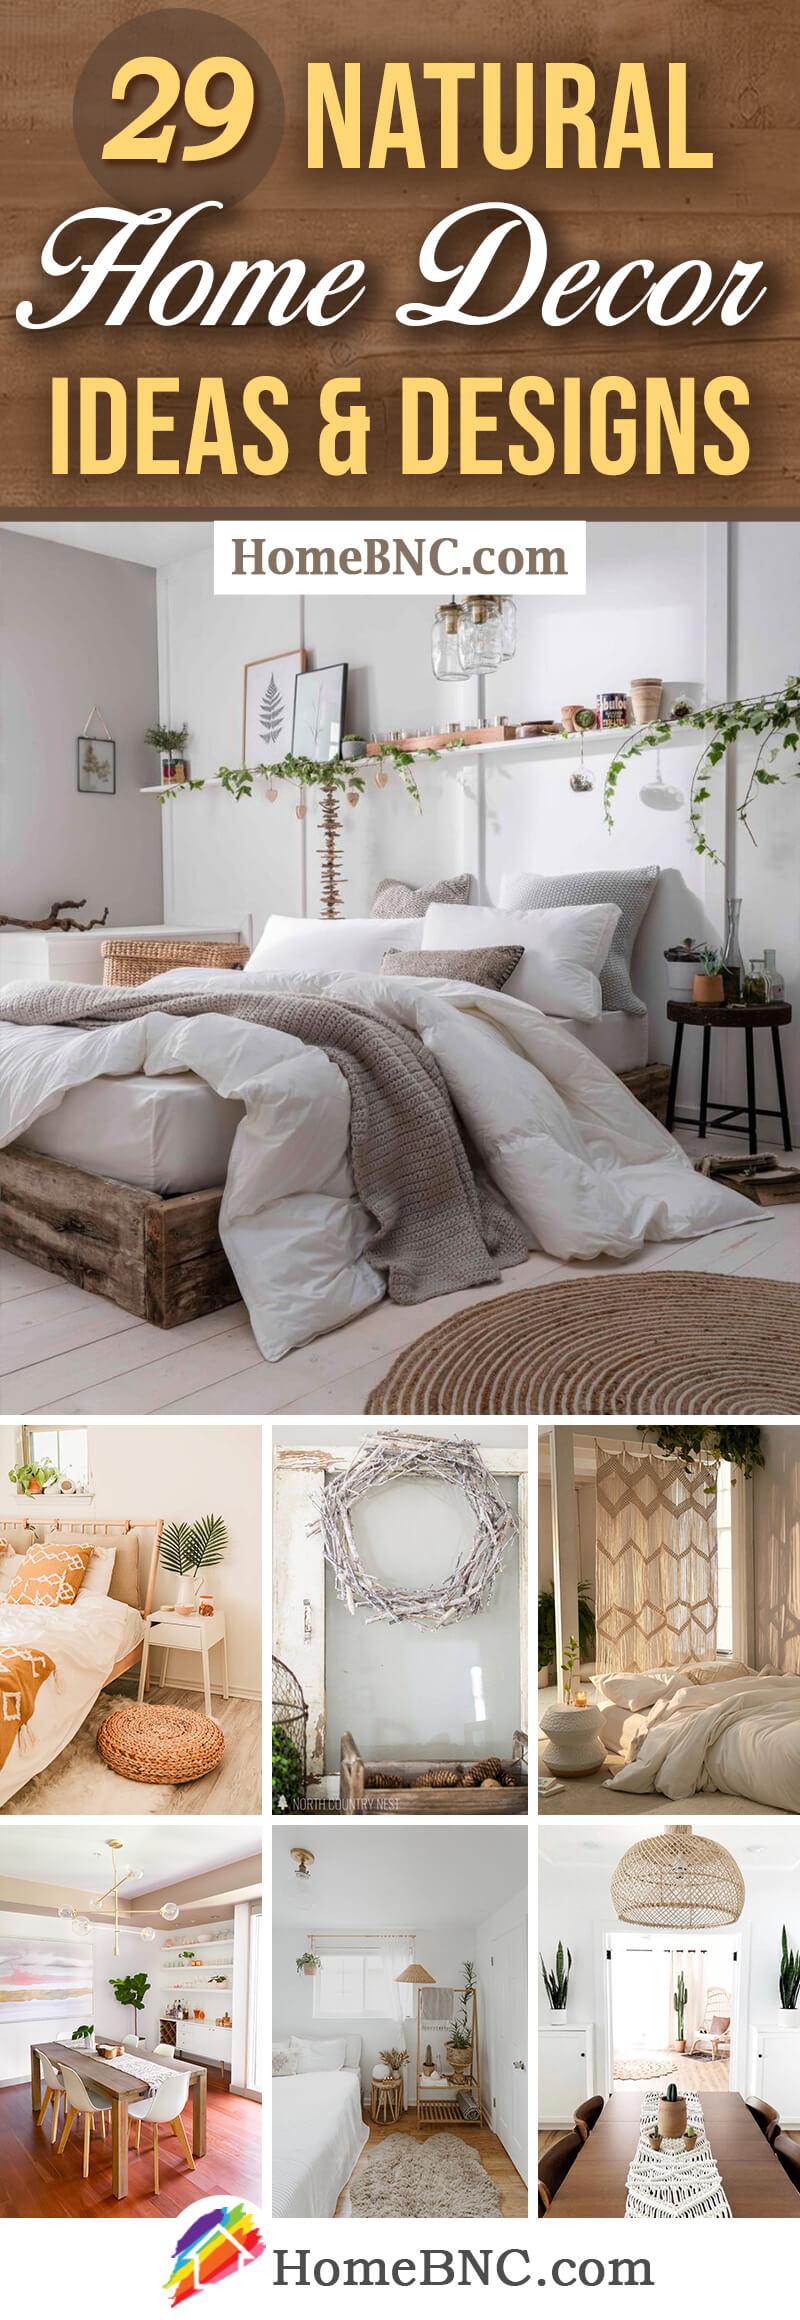 Best Natural Home Decor Ideas